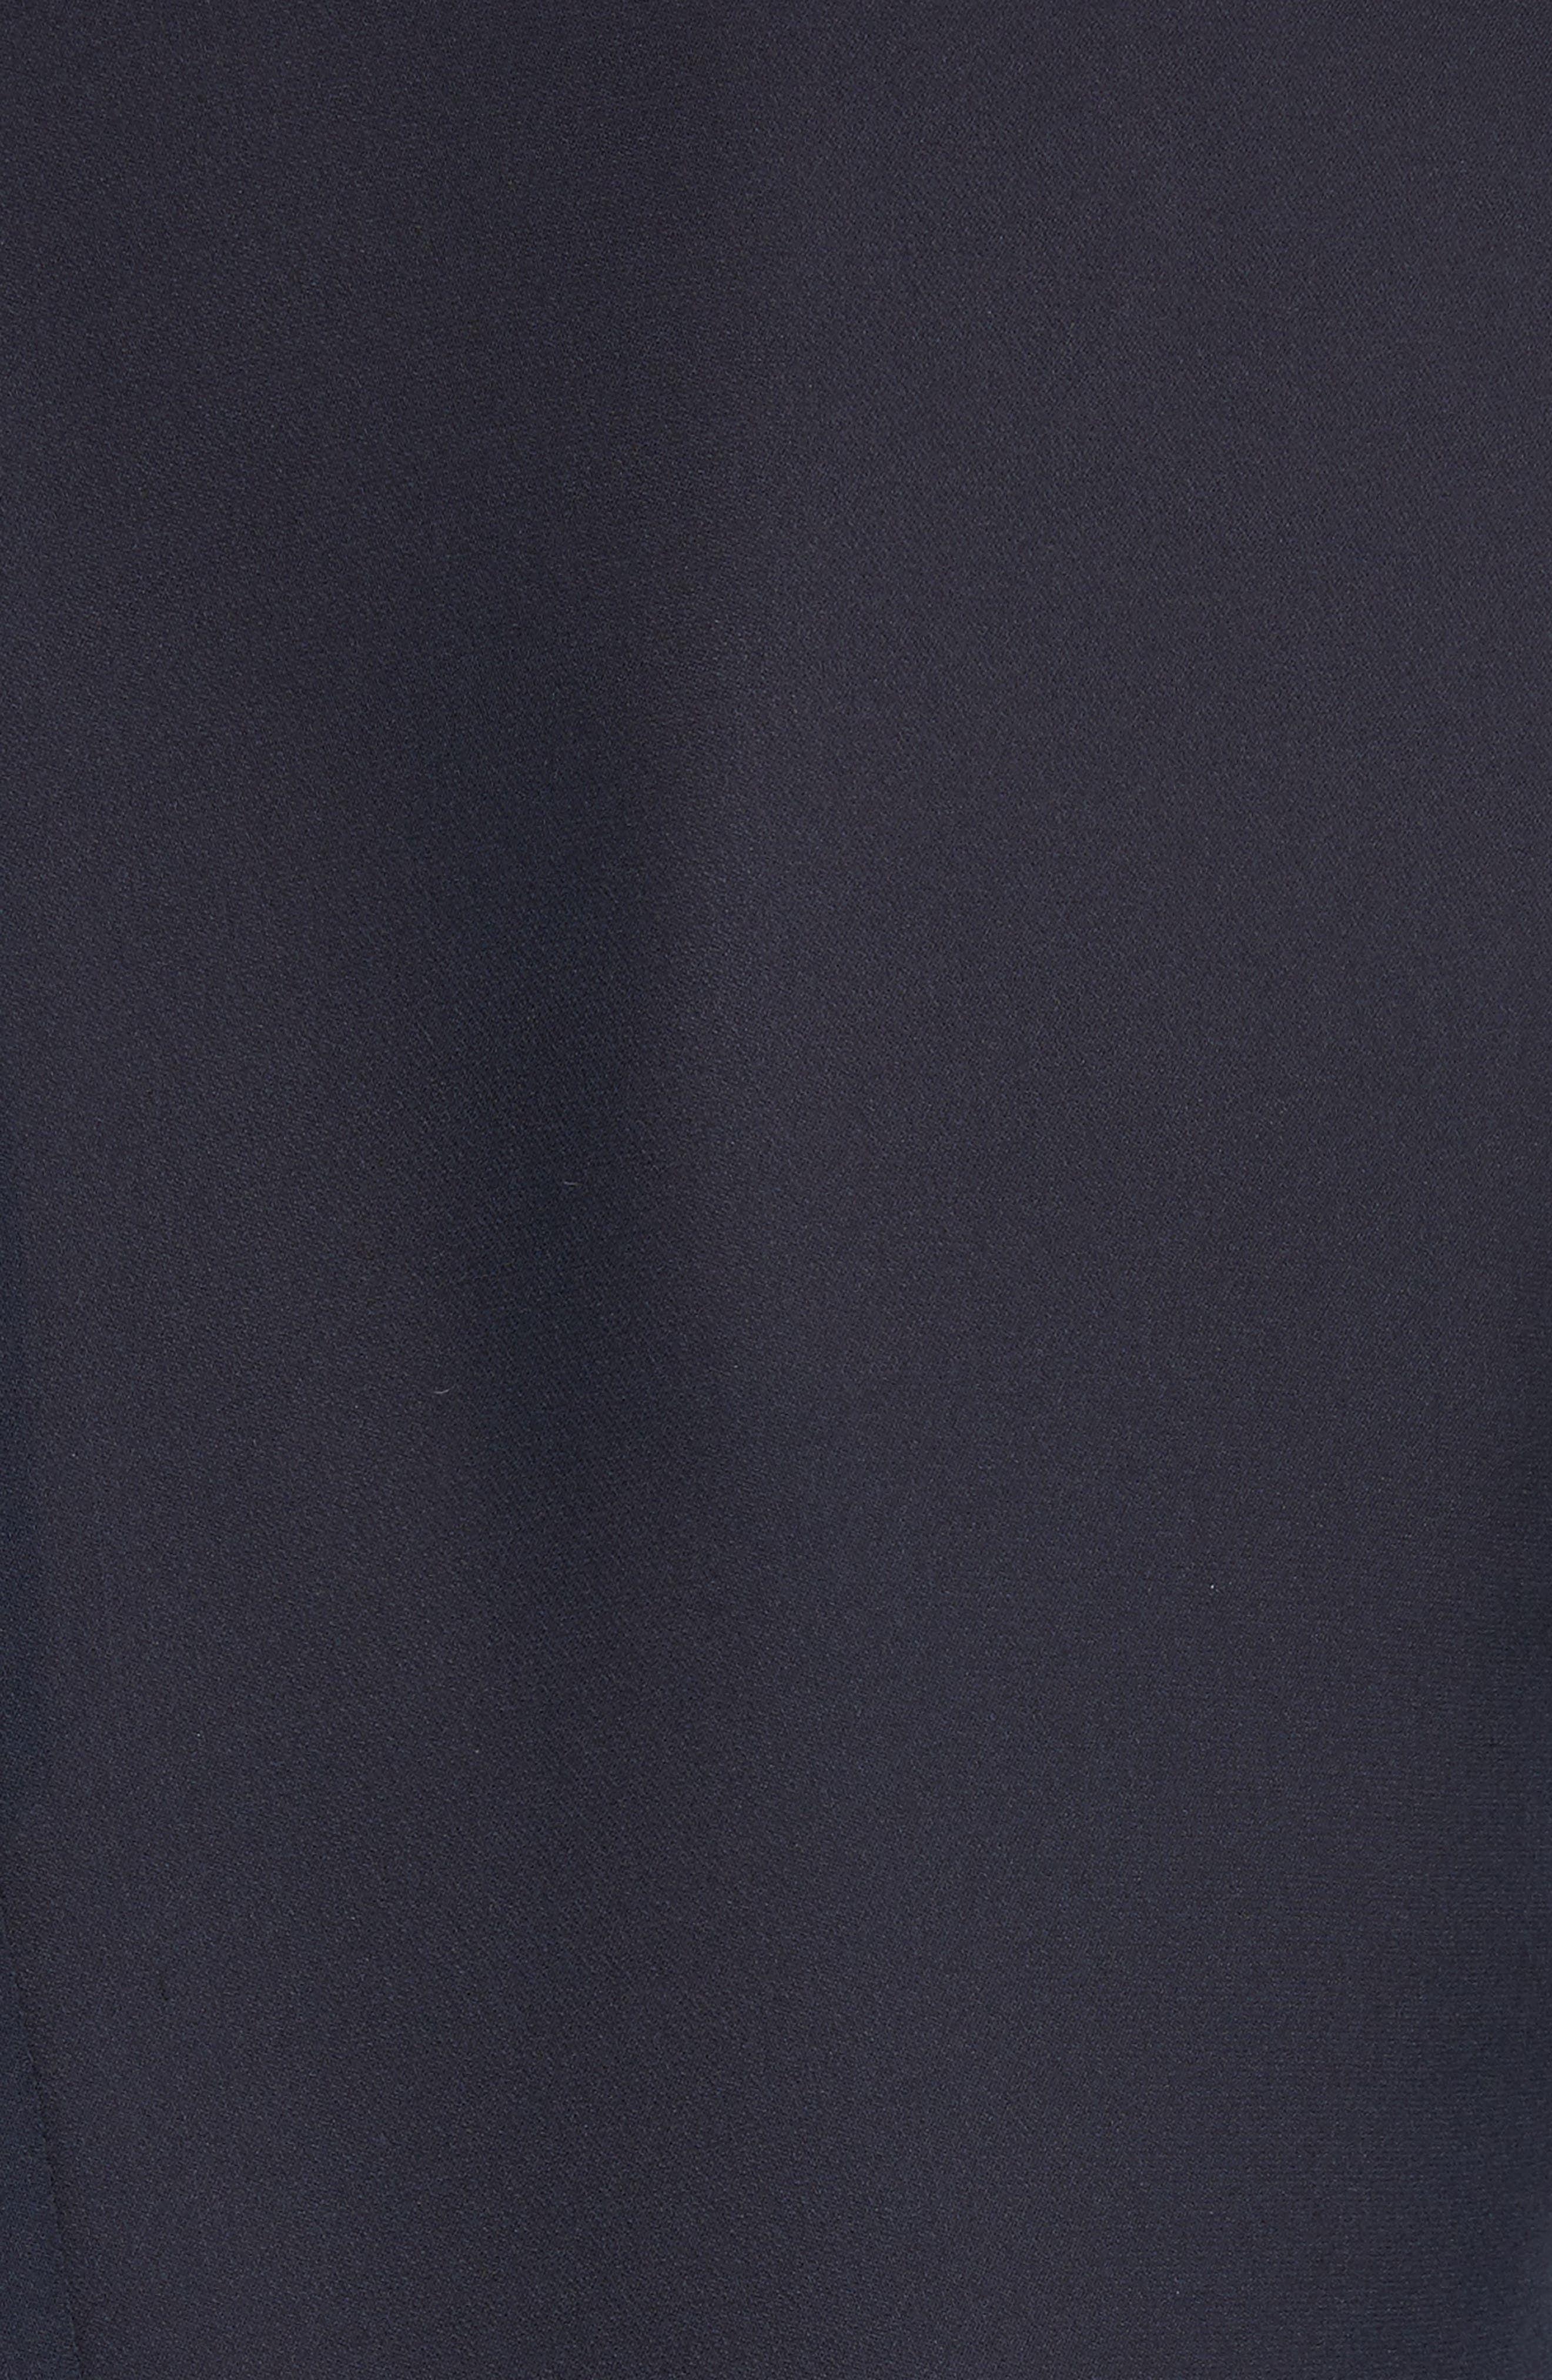 Scarf Neck Tie Blouson Sleeve Blouse,                             Alternate thumbnail 5, color,